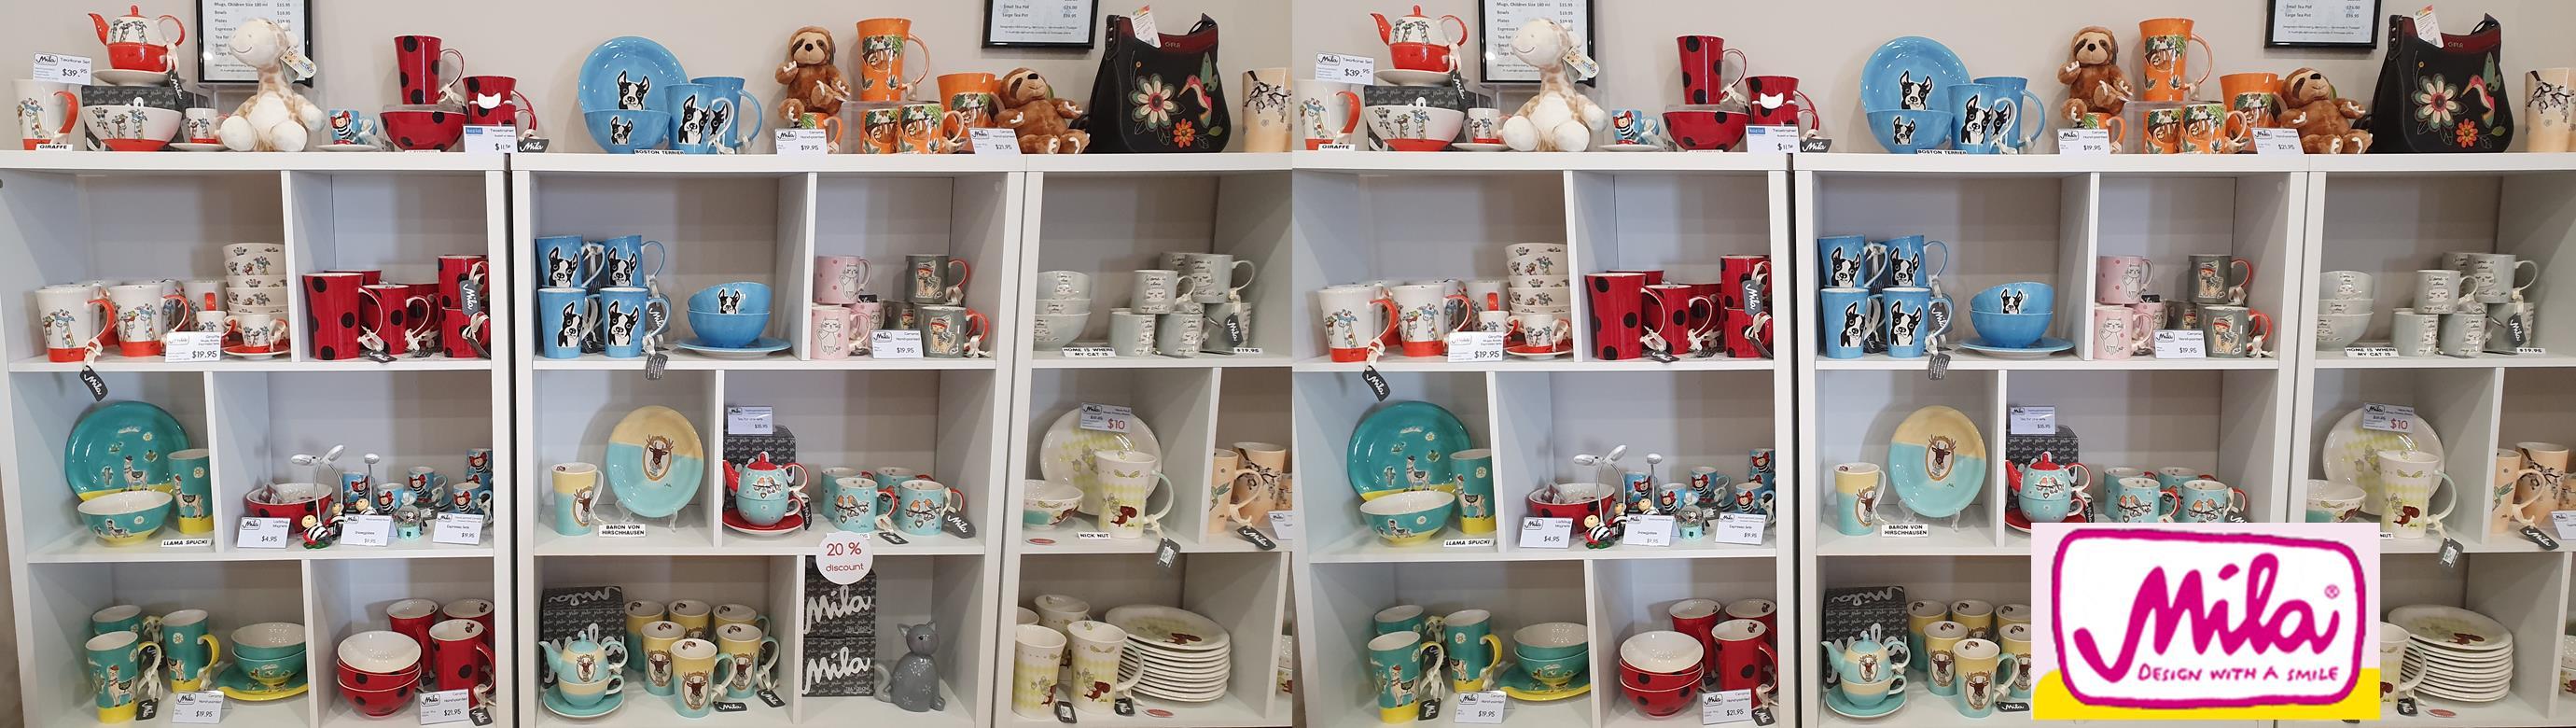 mila-ceramics.jpg